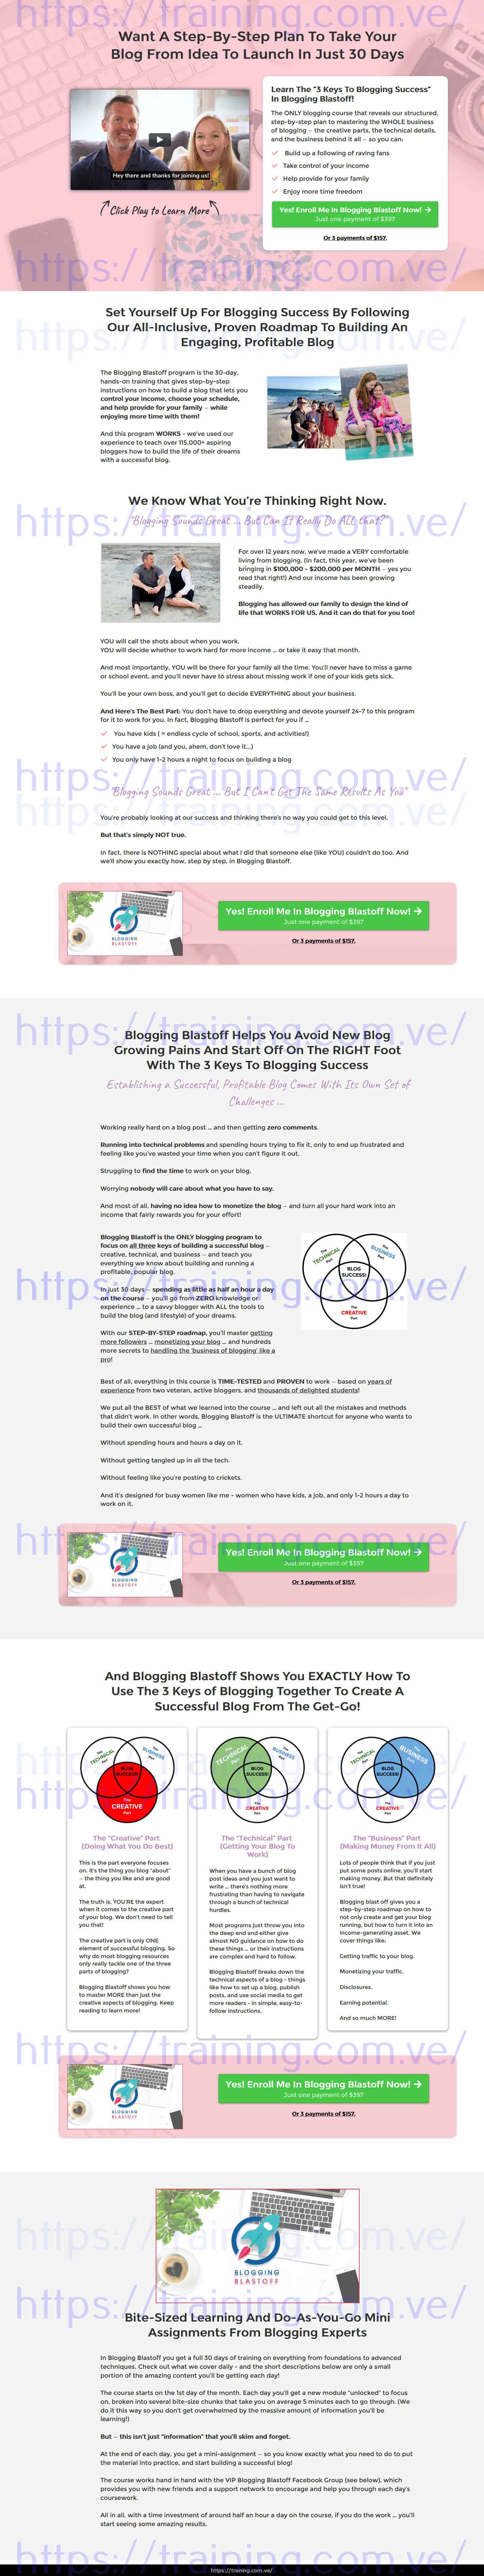 Blogging Blastoff by Heather Delaney Reese Buy